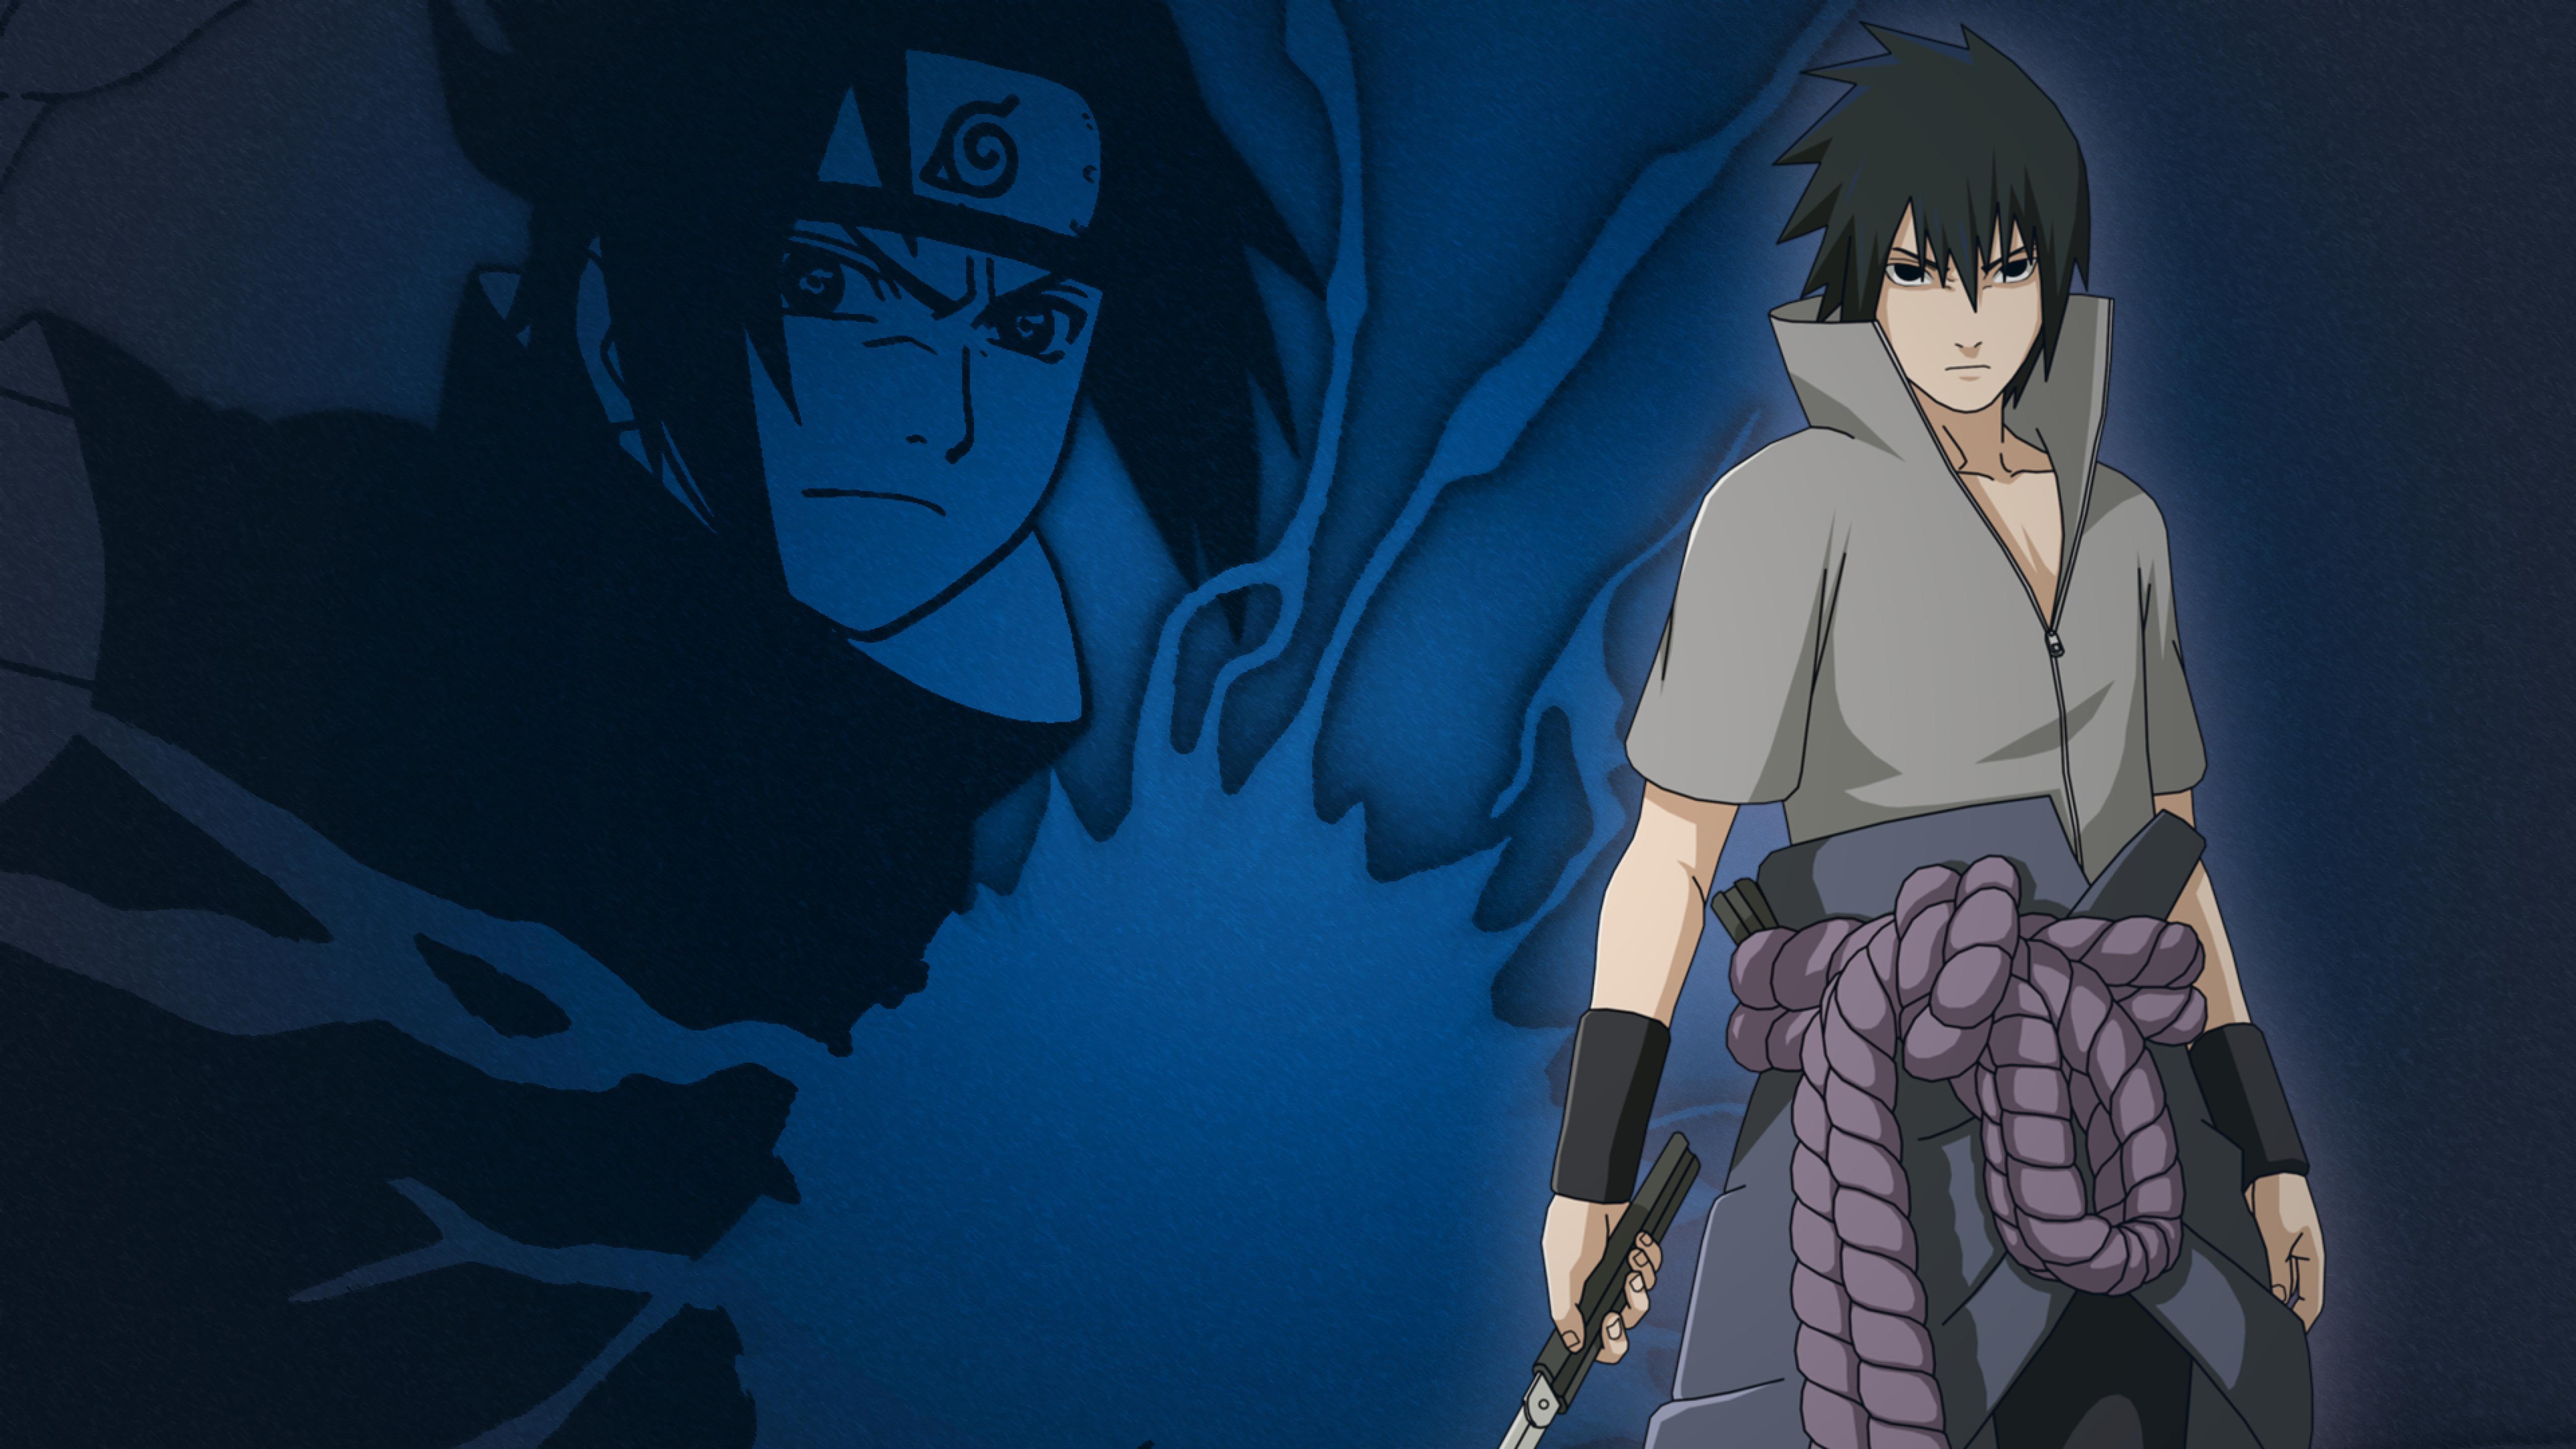 Anime Sasuke Uchiha Wallpapers - Wallpaper Cave